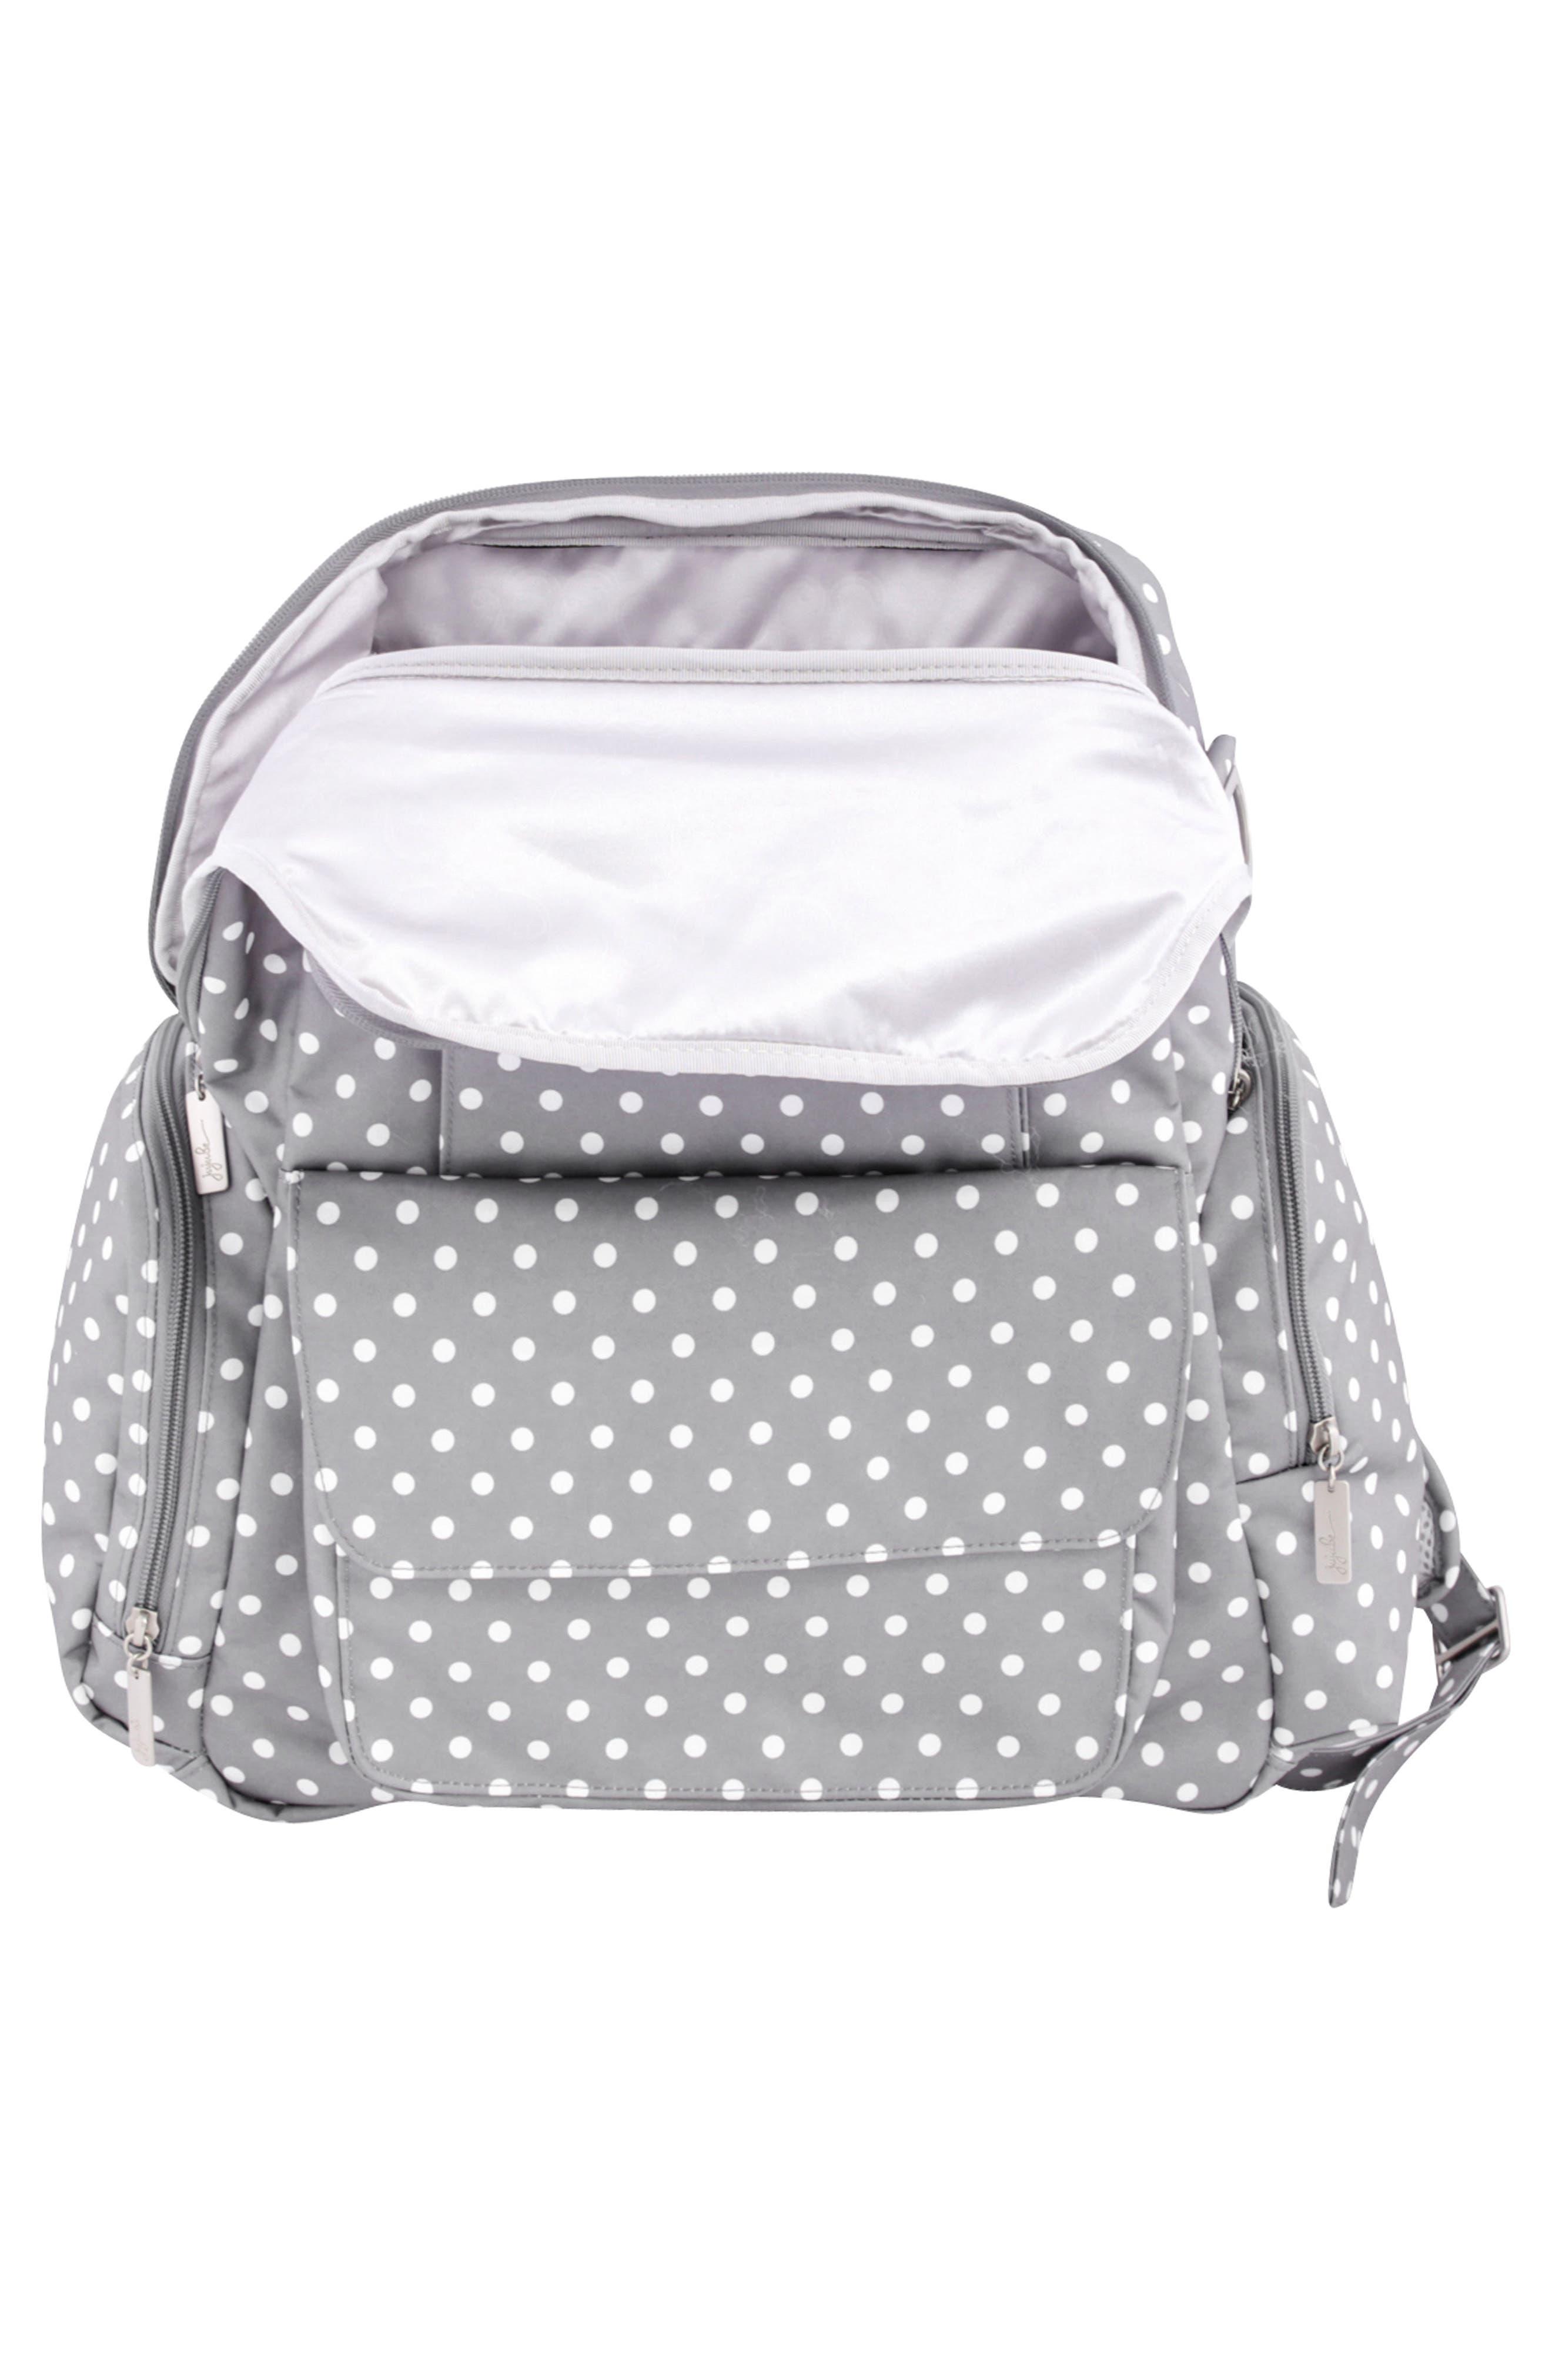 Be Nurtured Pumping Backpack,                             Alternate thumbnail 4, color,                             020